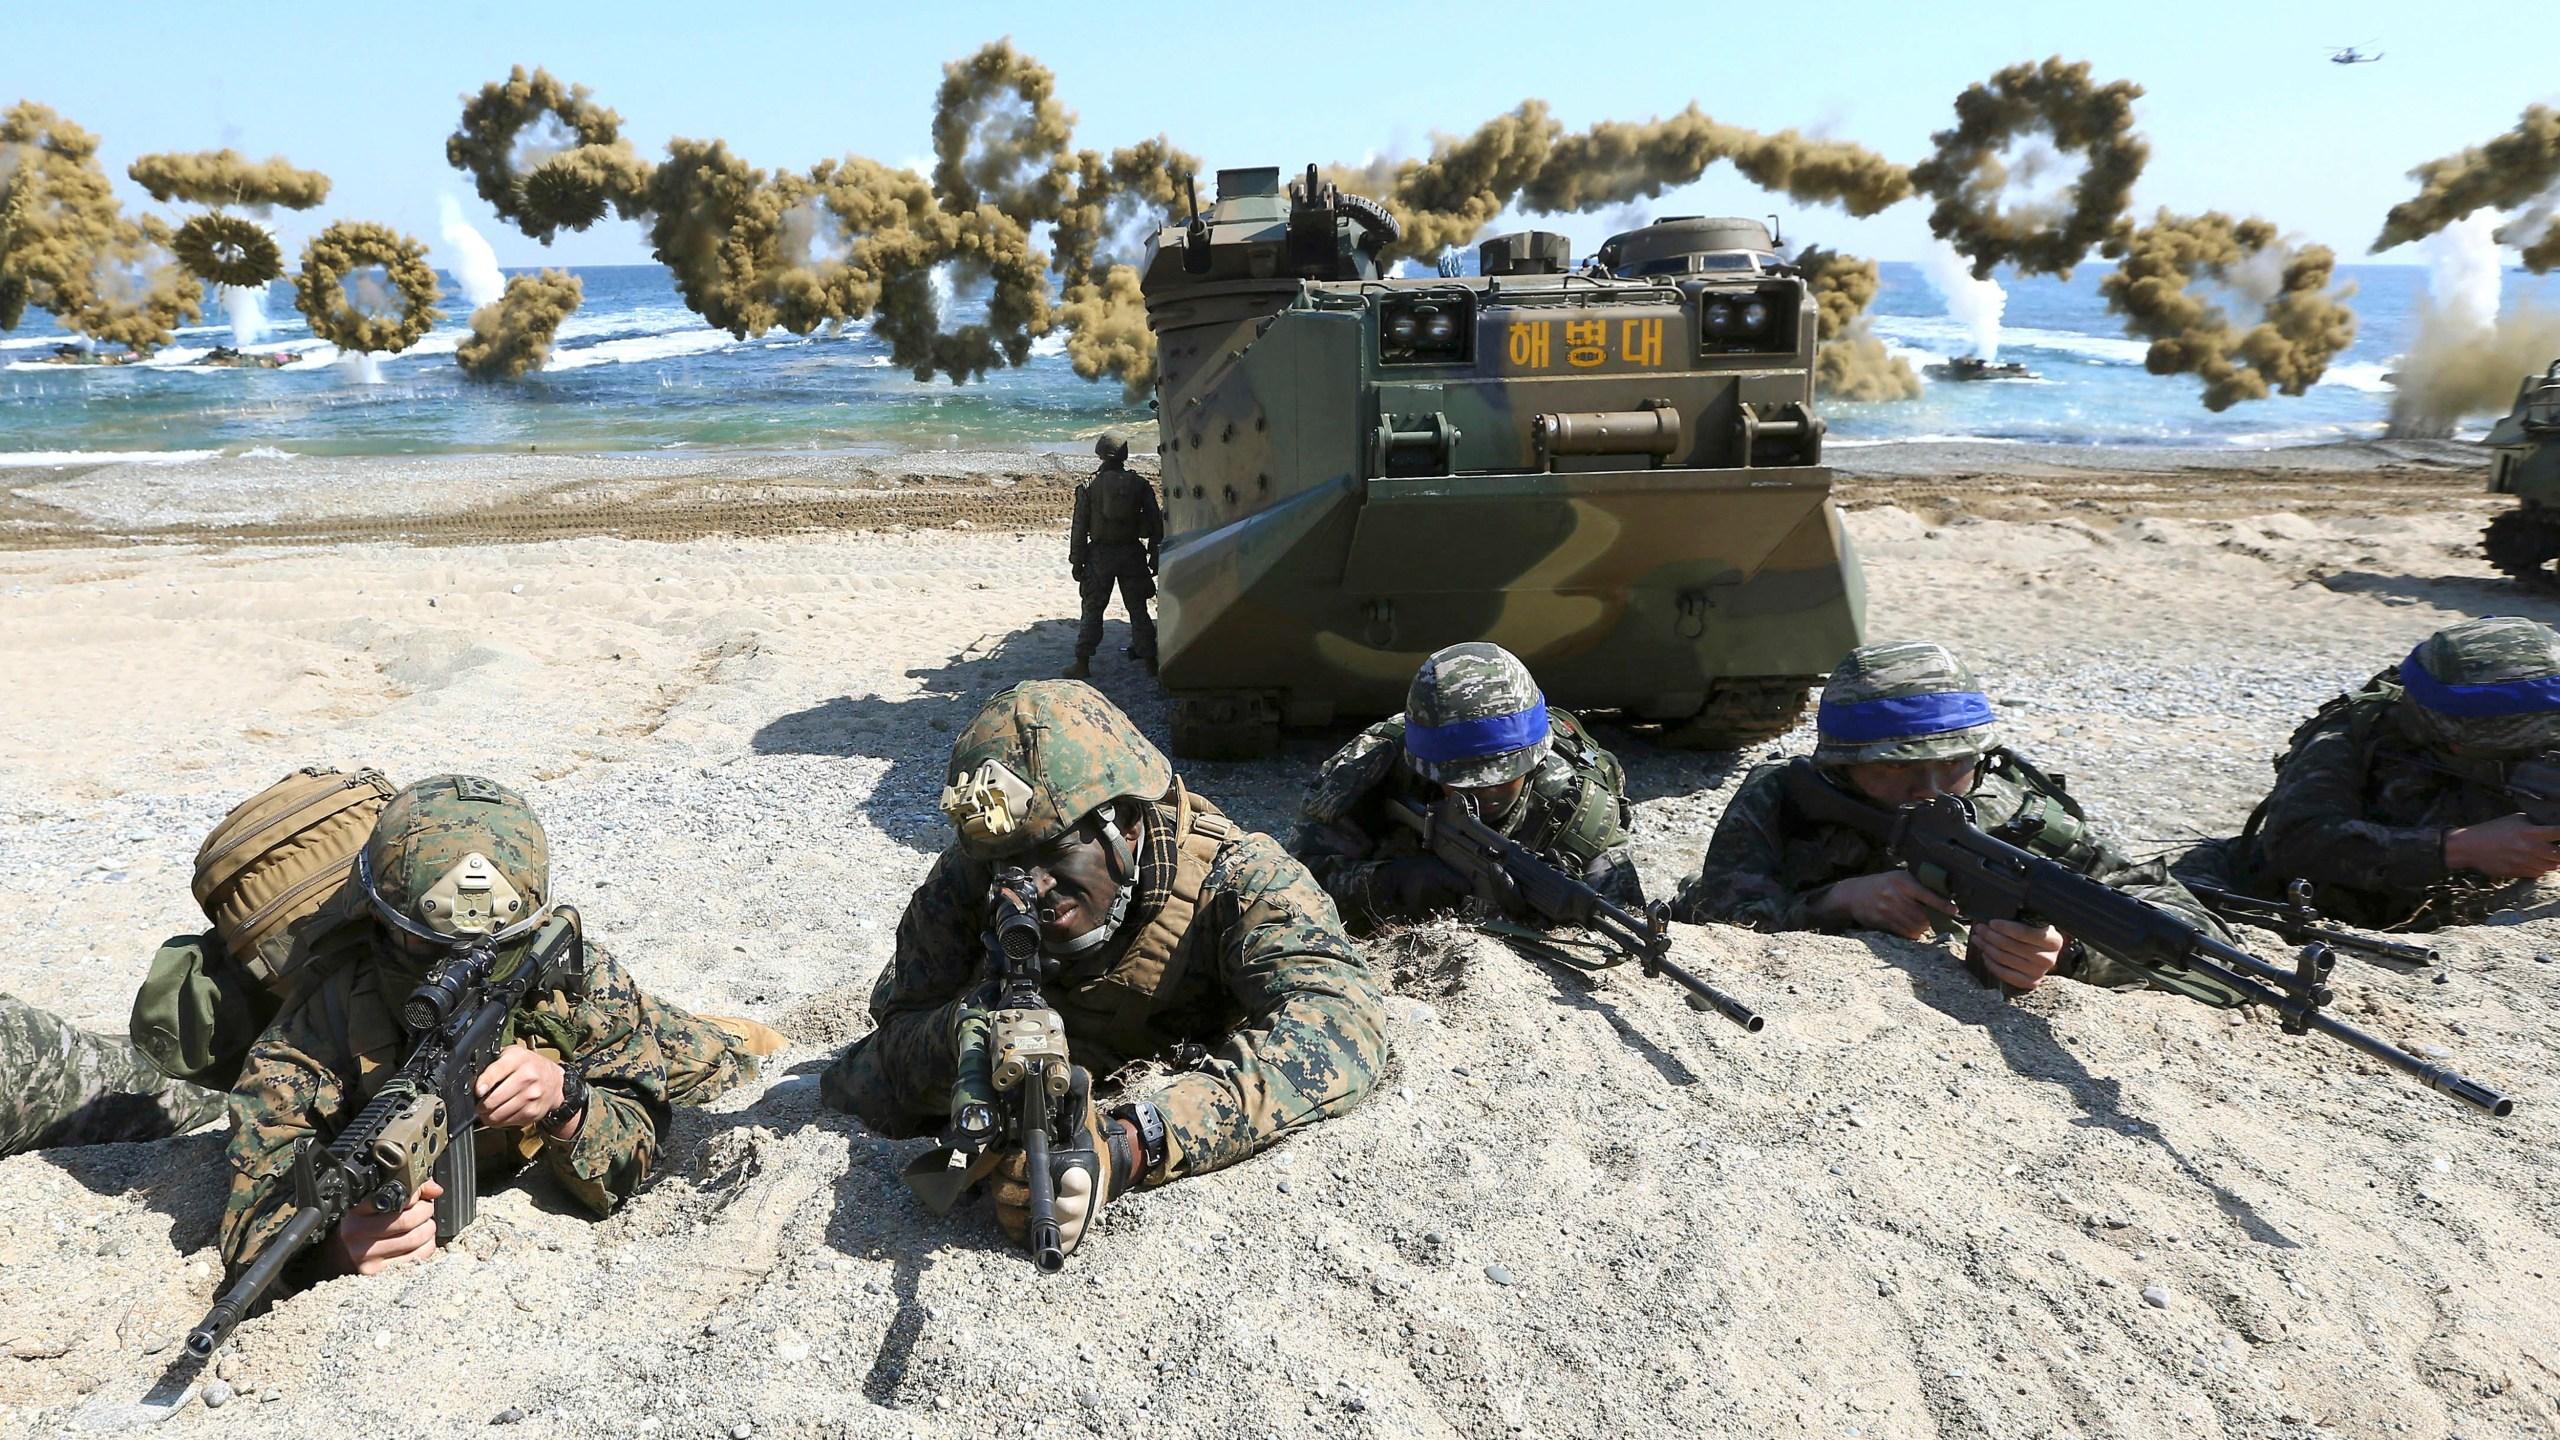 United_States_Korea_Military_Exercises_95053-159532.jpg72833728